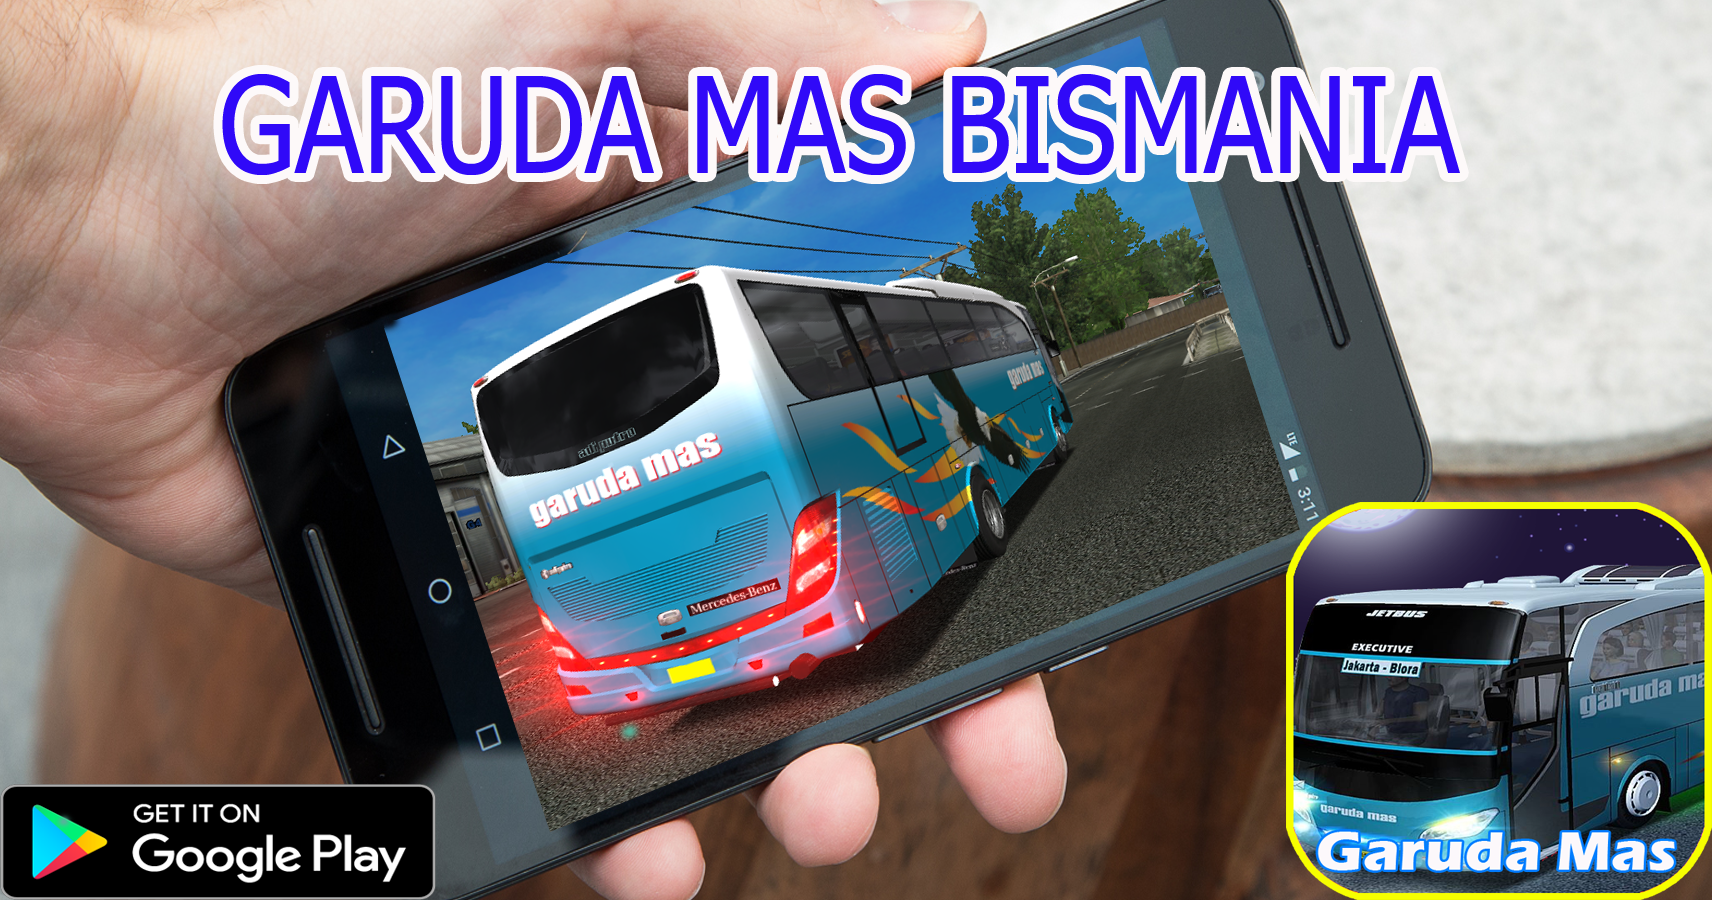 PO Garuda Mas Bismania Apl Android Di Google Play